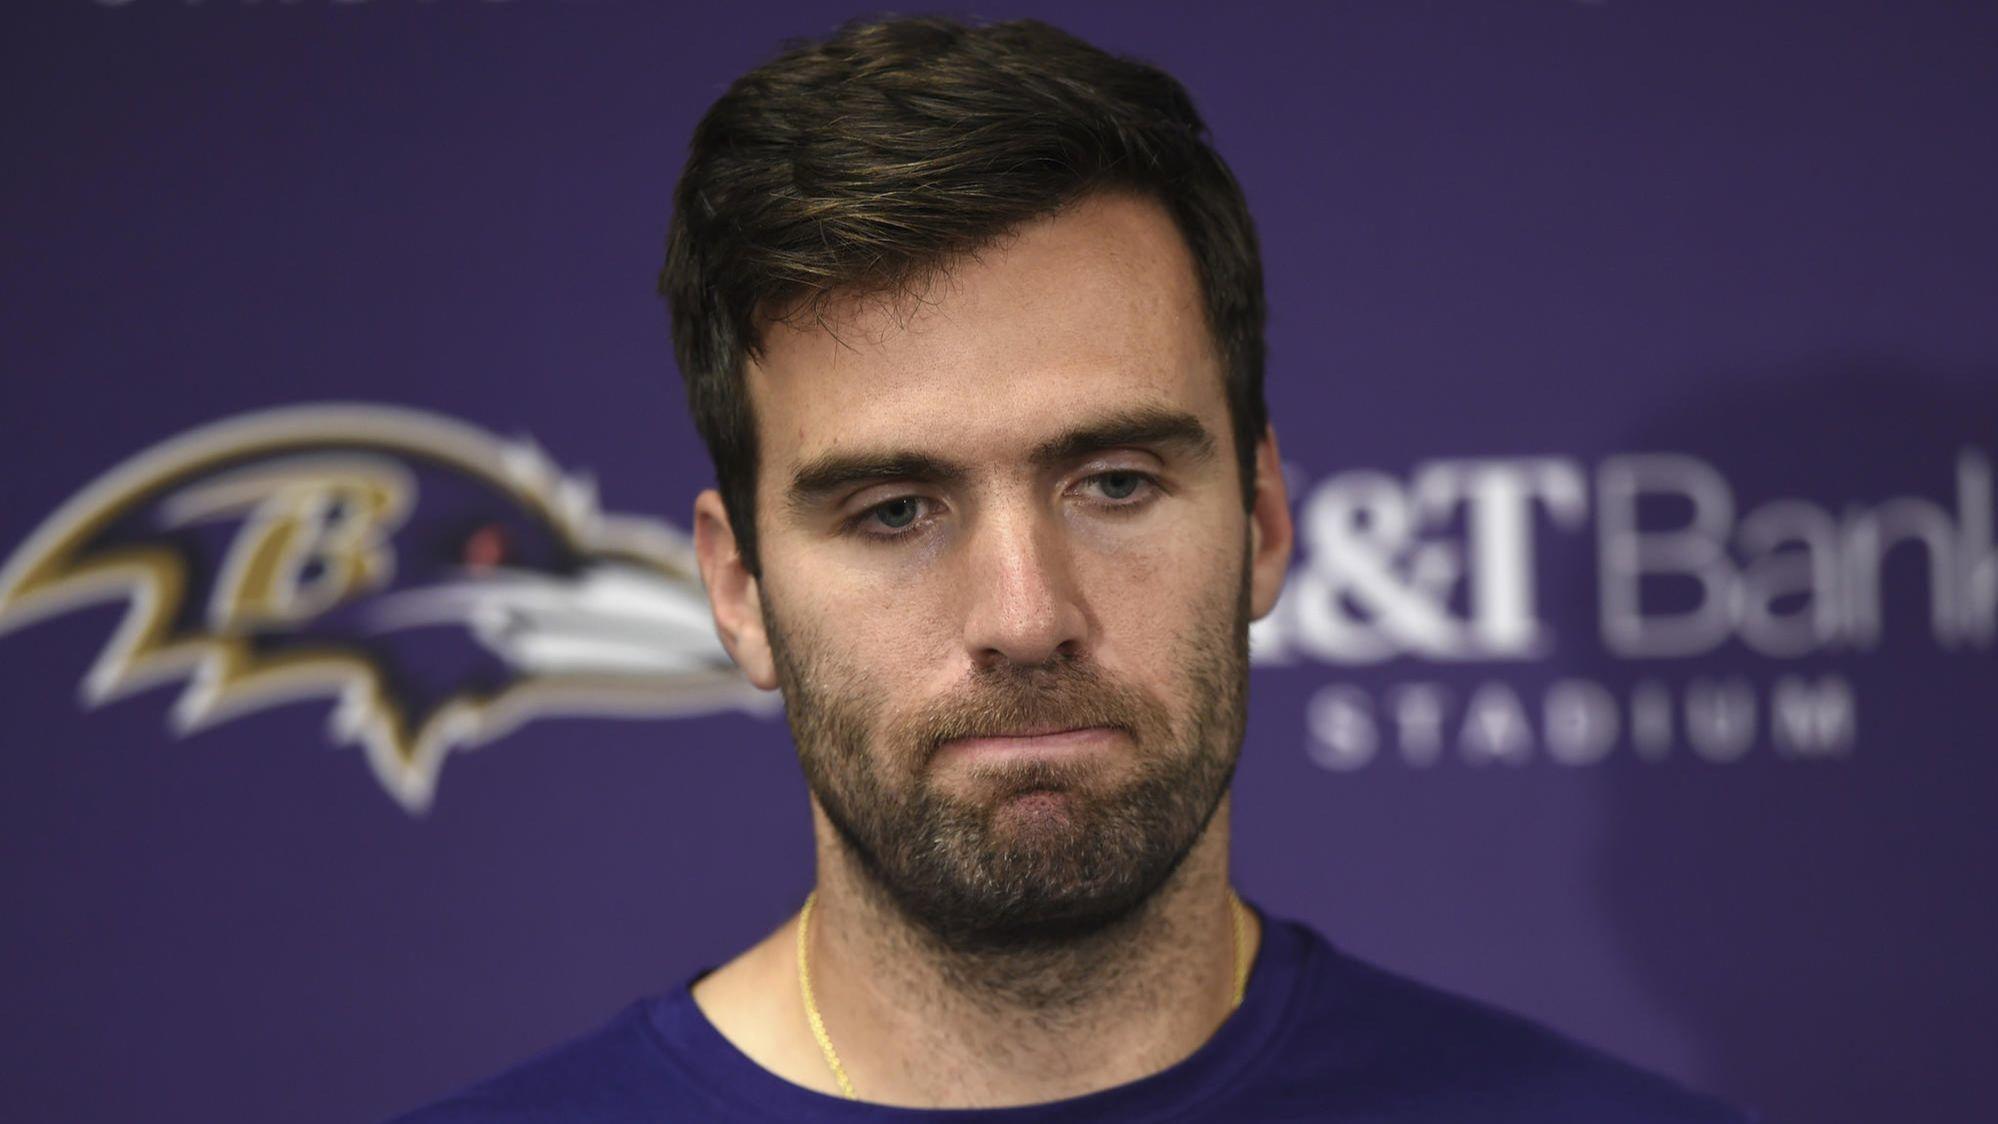 baltimoresun.com - Jonas Shaffer - John Harbaugh: Ravens QB Joe Flacco likely will be a game-time decision vs. Bengals